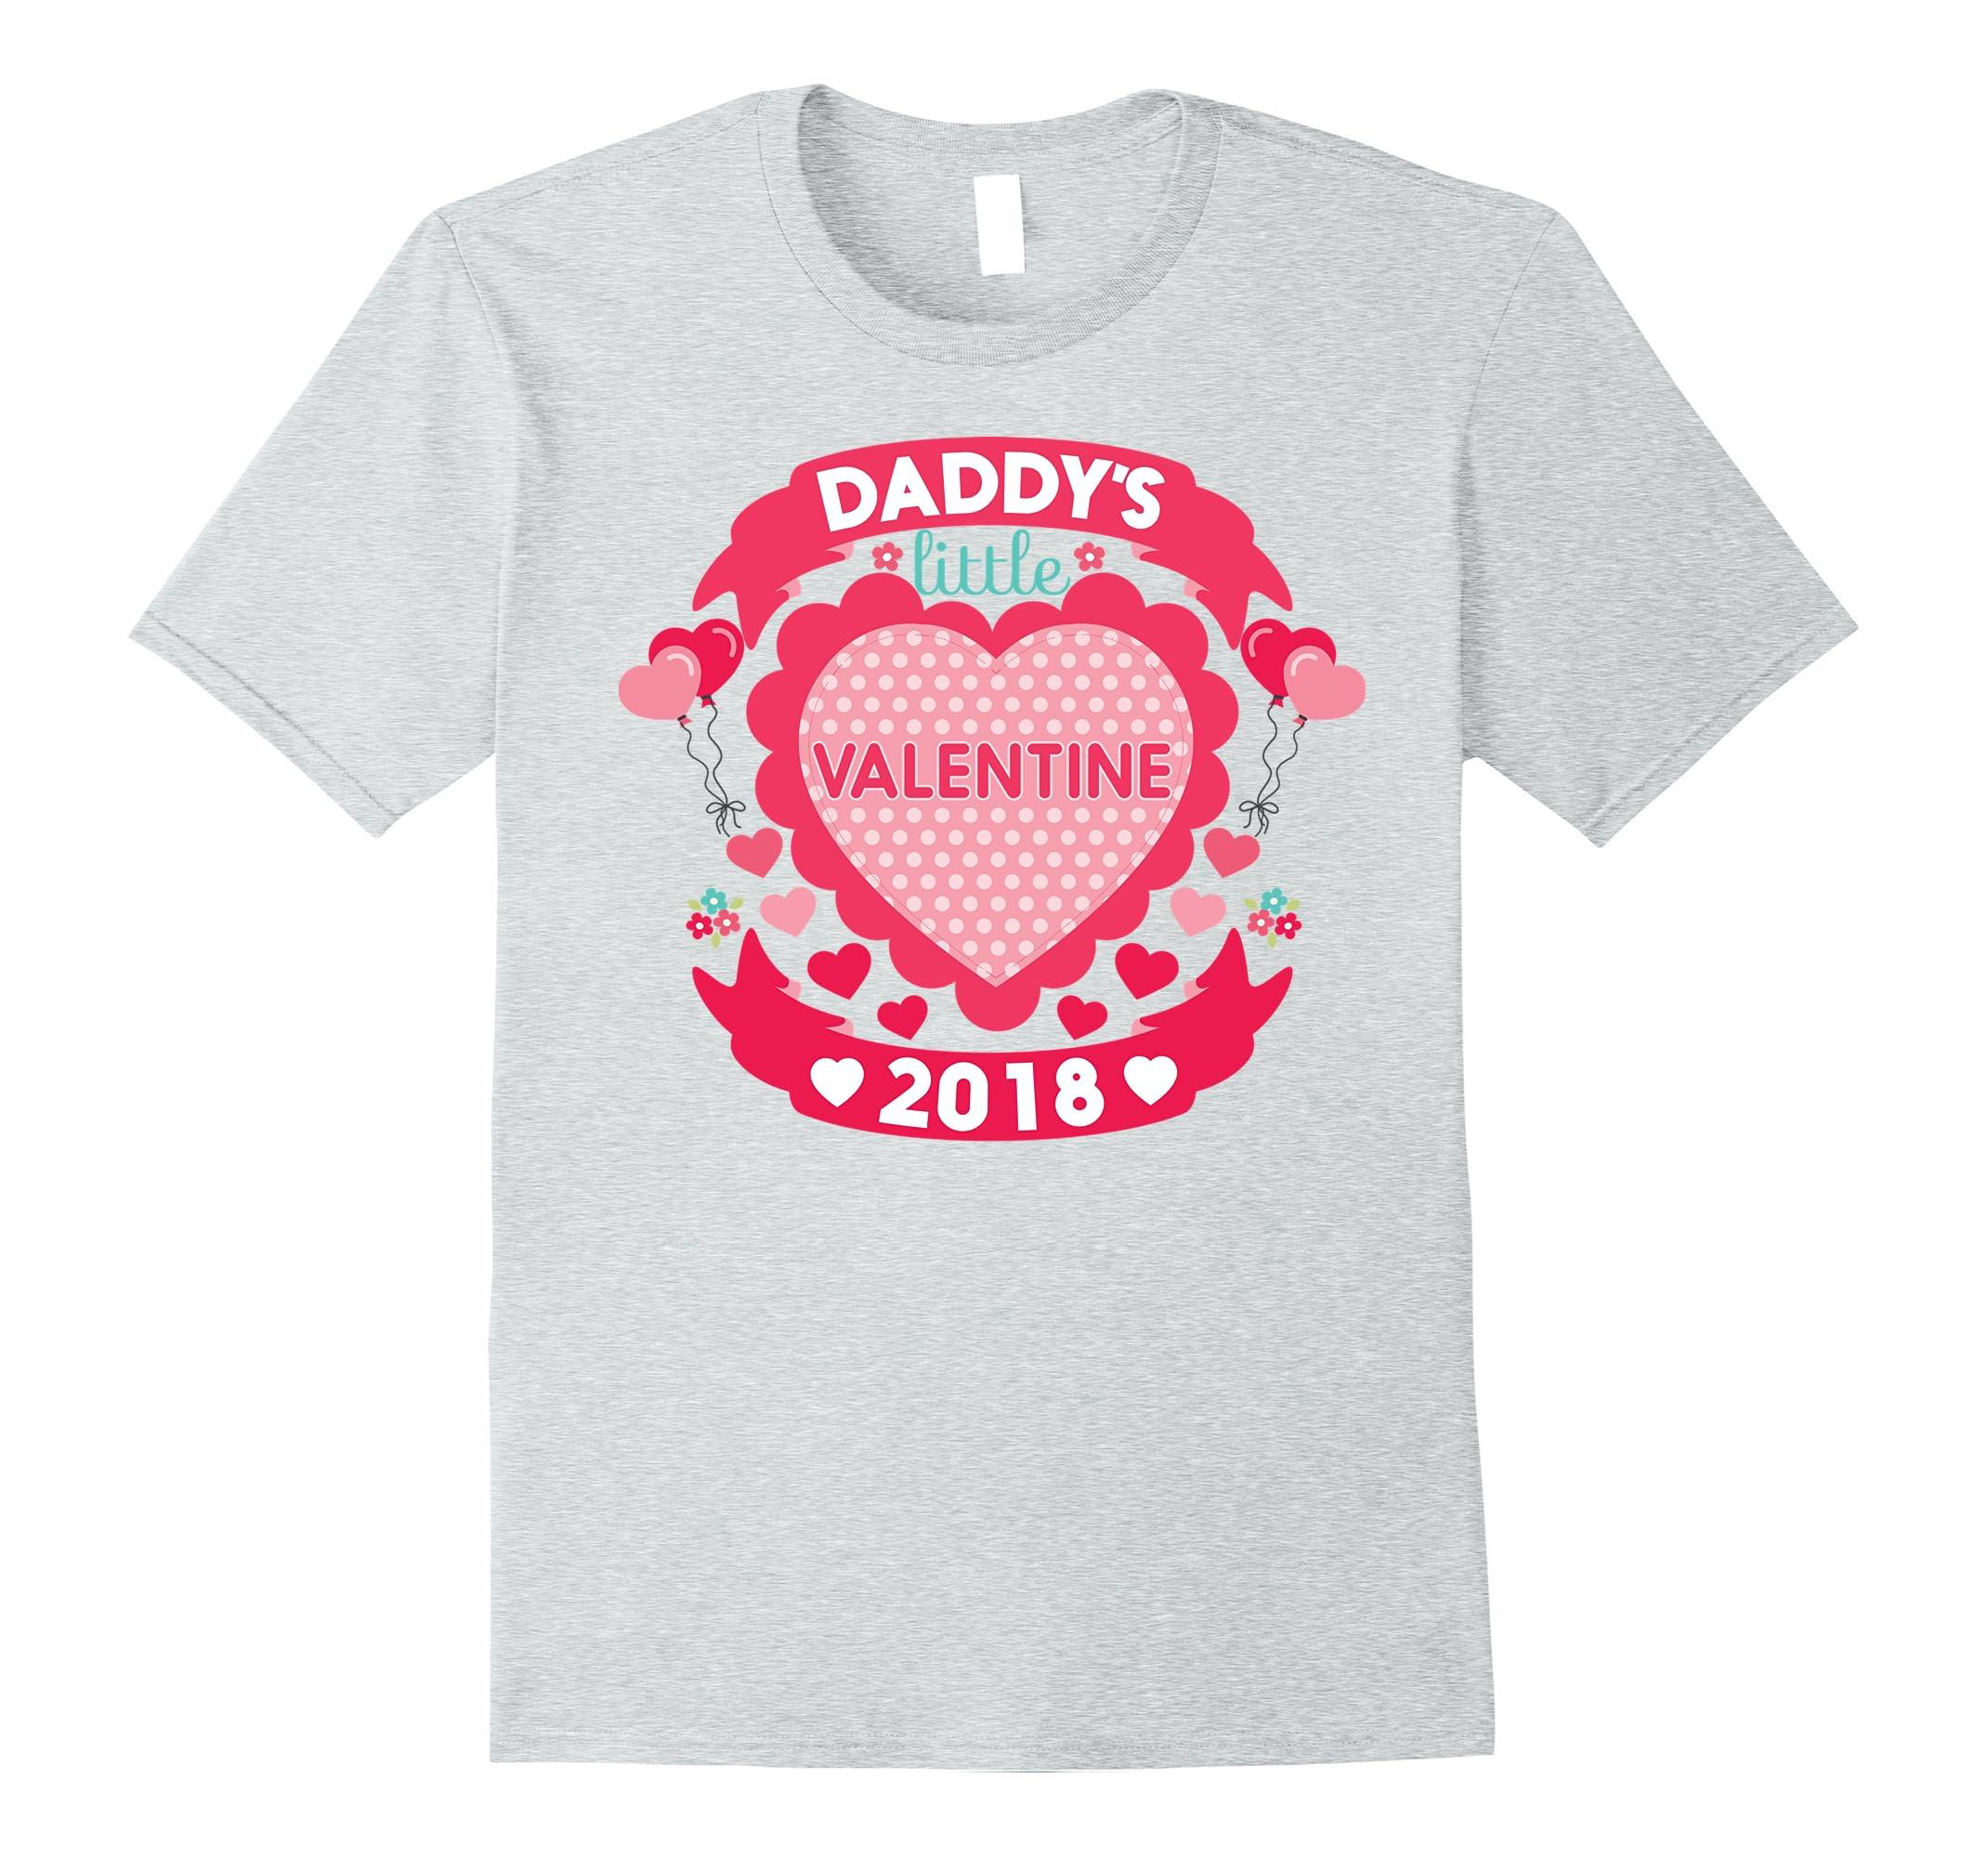 Daddy S Little Valentine Cute Valentine S Day Shirt For Kids Rt